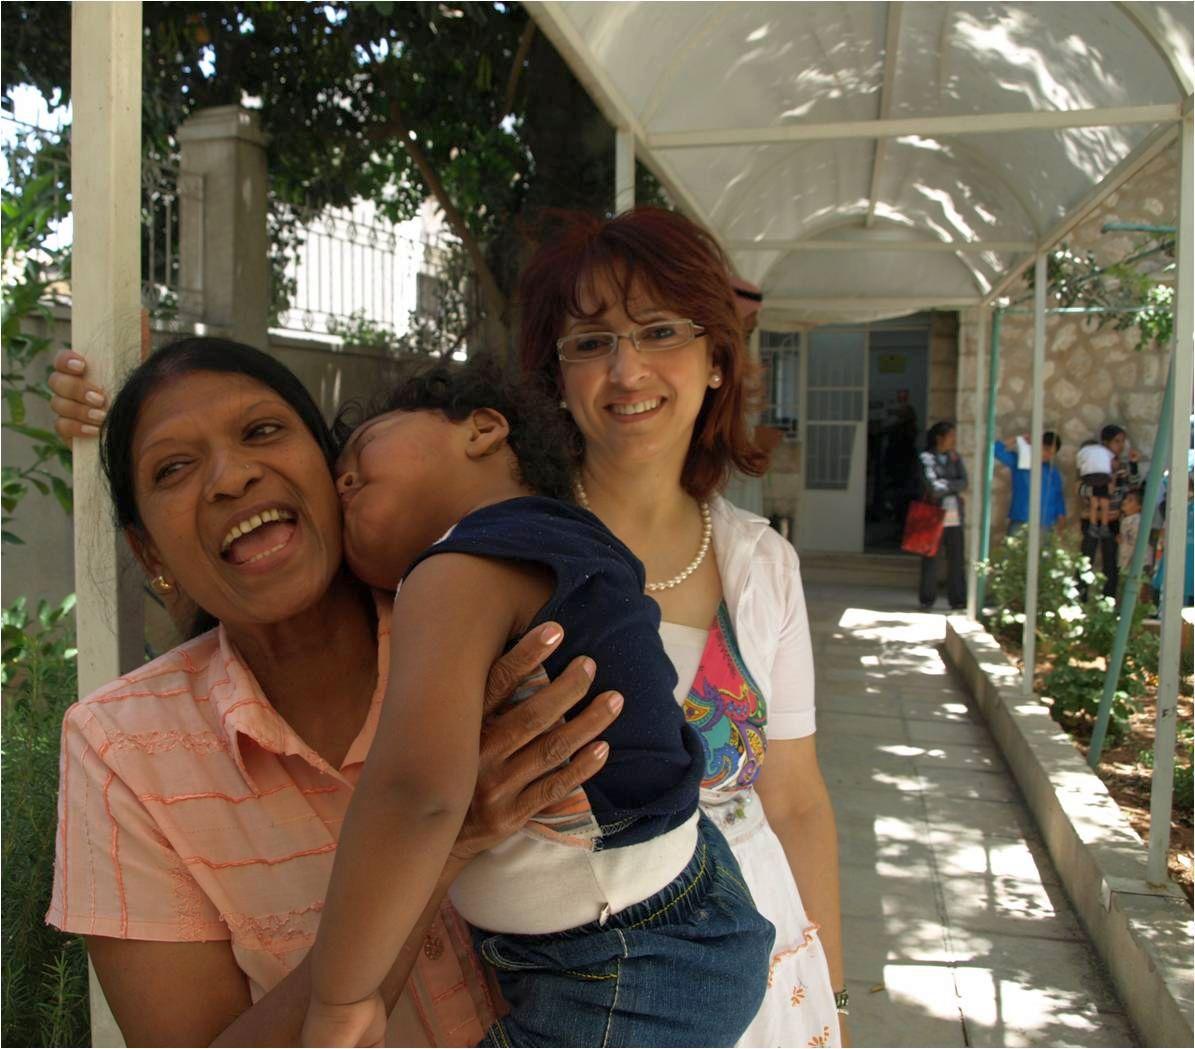 Caritas Jordan medical centre in Amman provides healthcare to migrants. Credit: Michelle Hough/Caritas